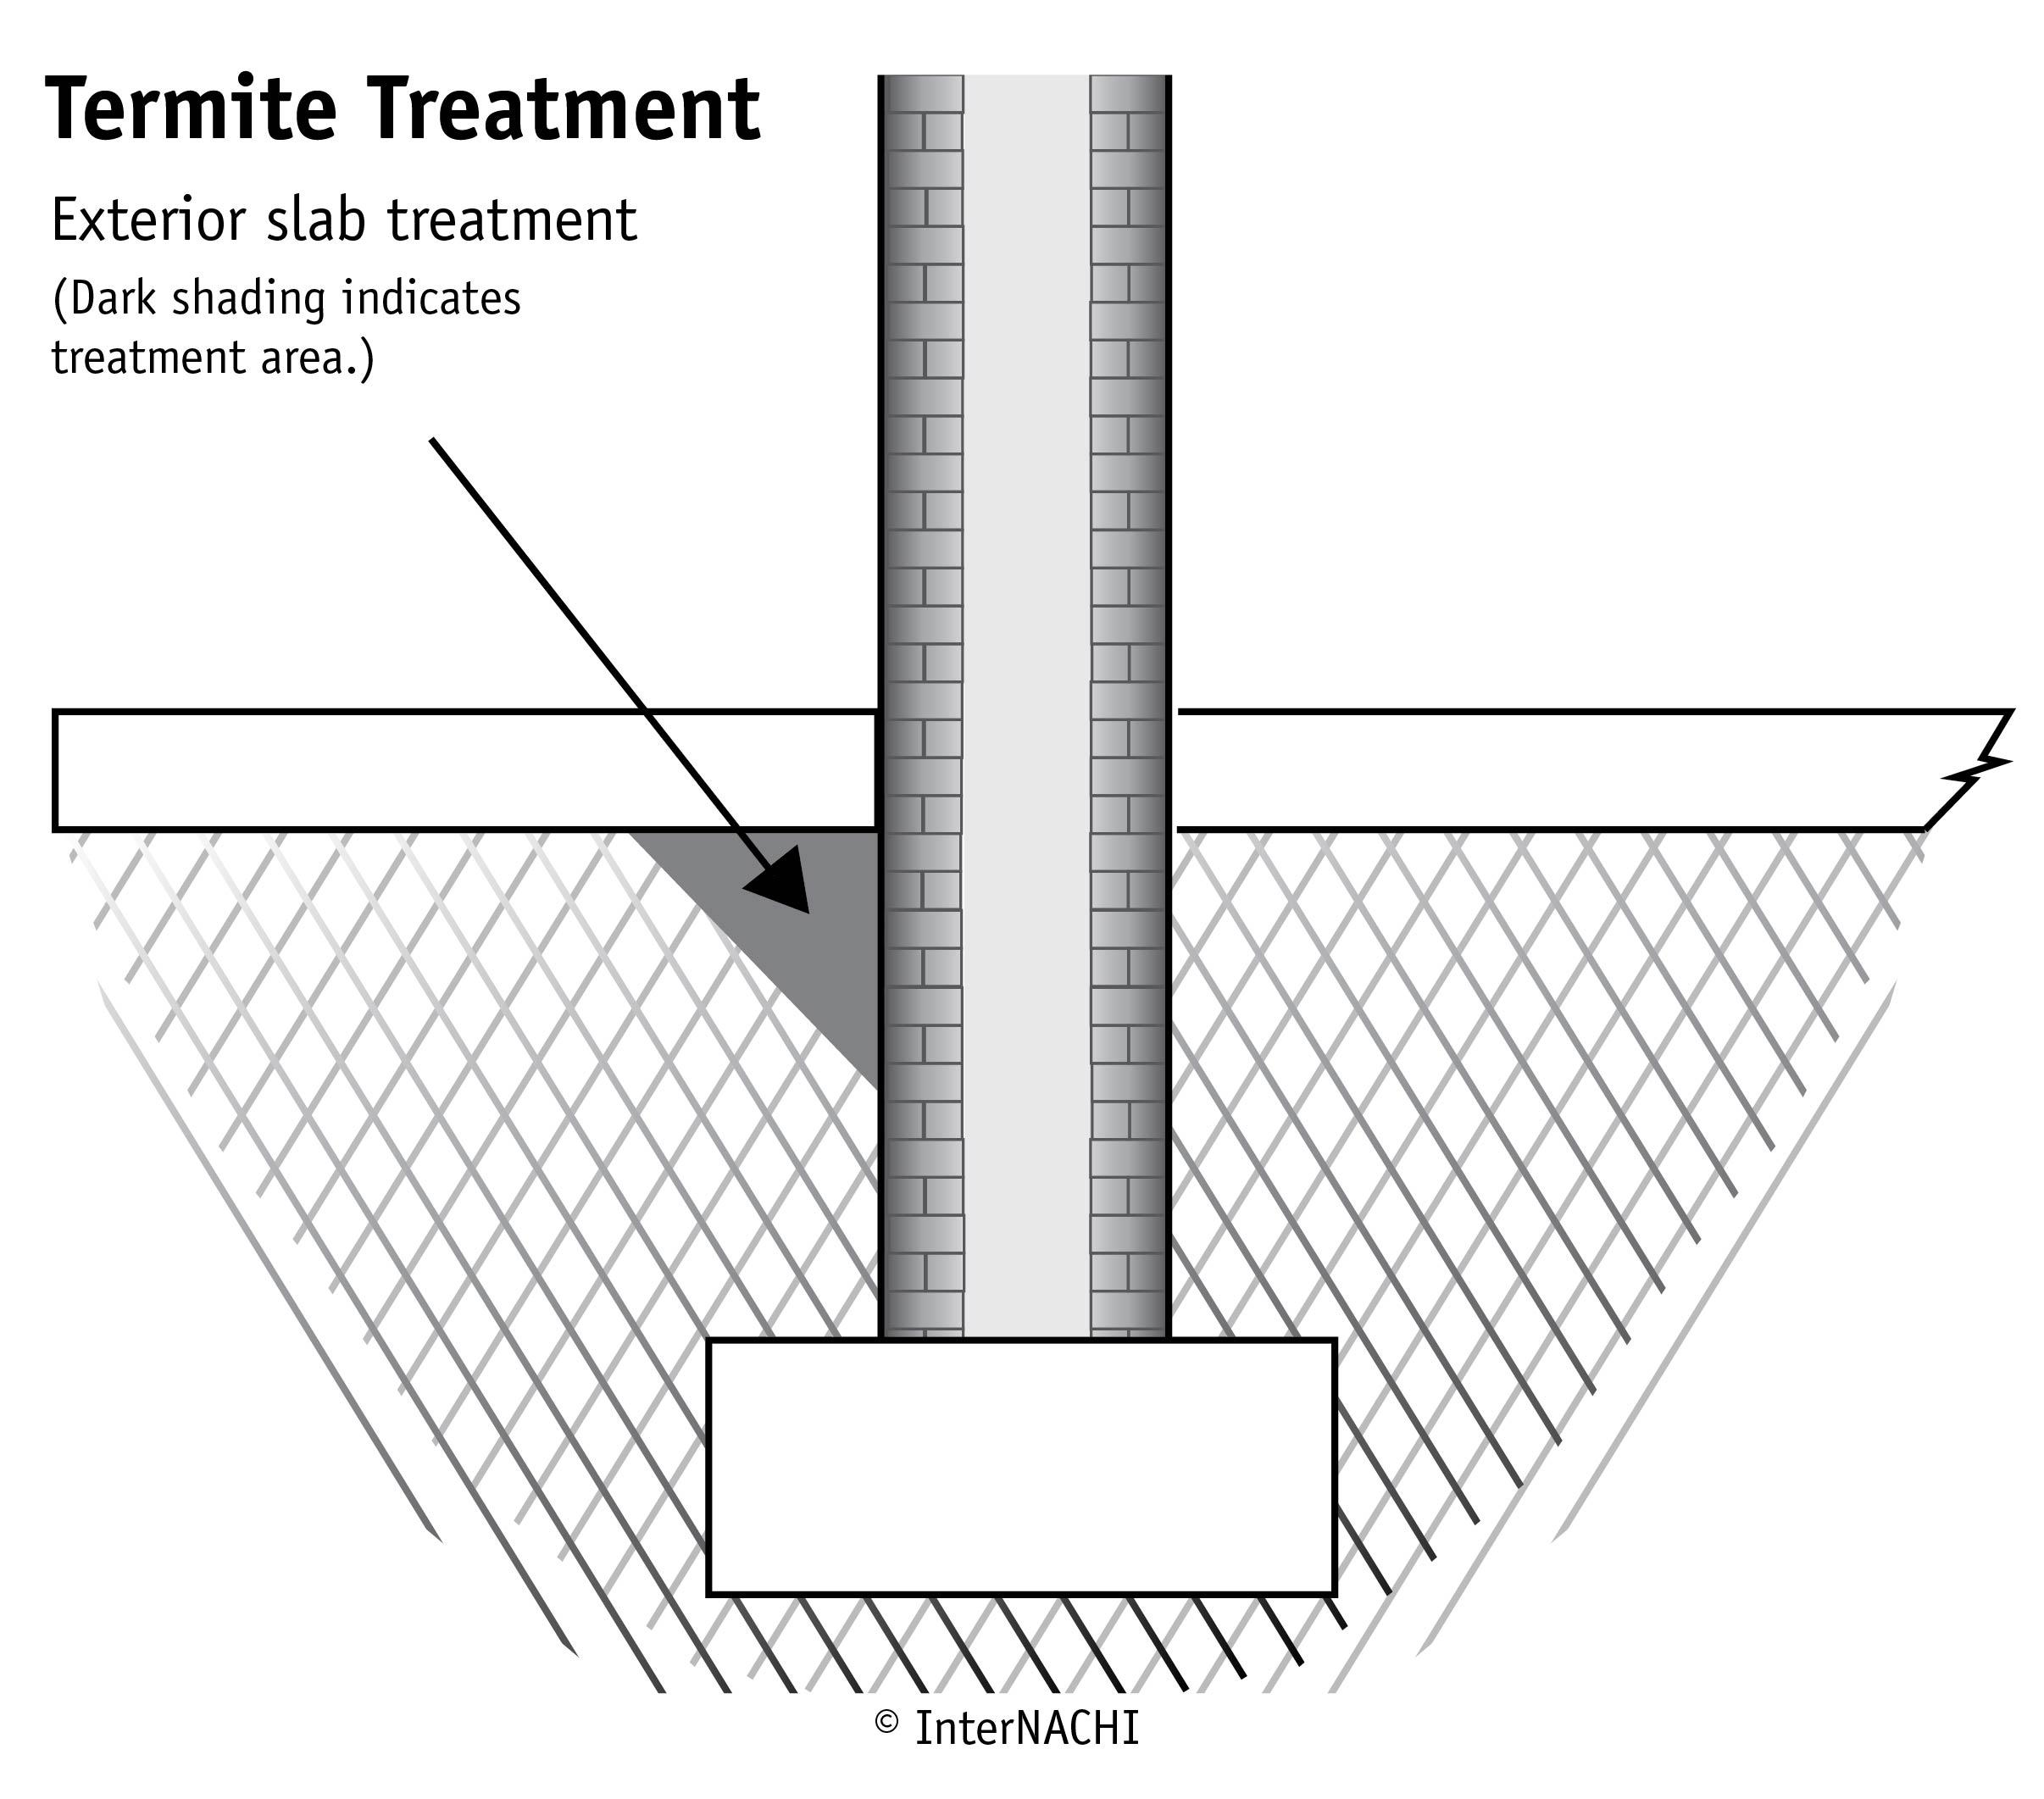 Termite treatment.